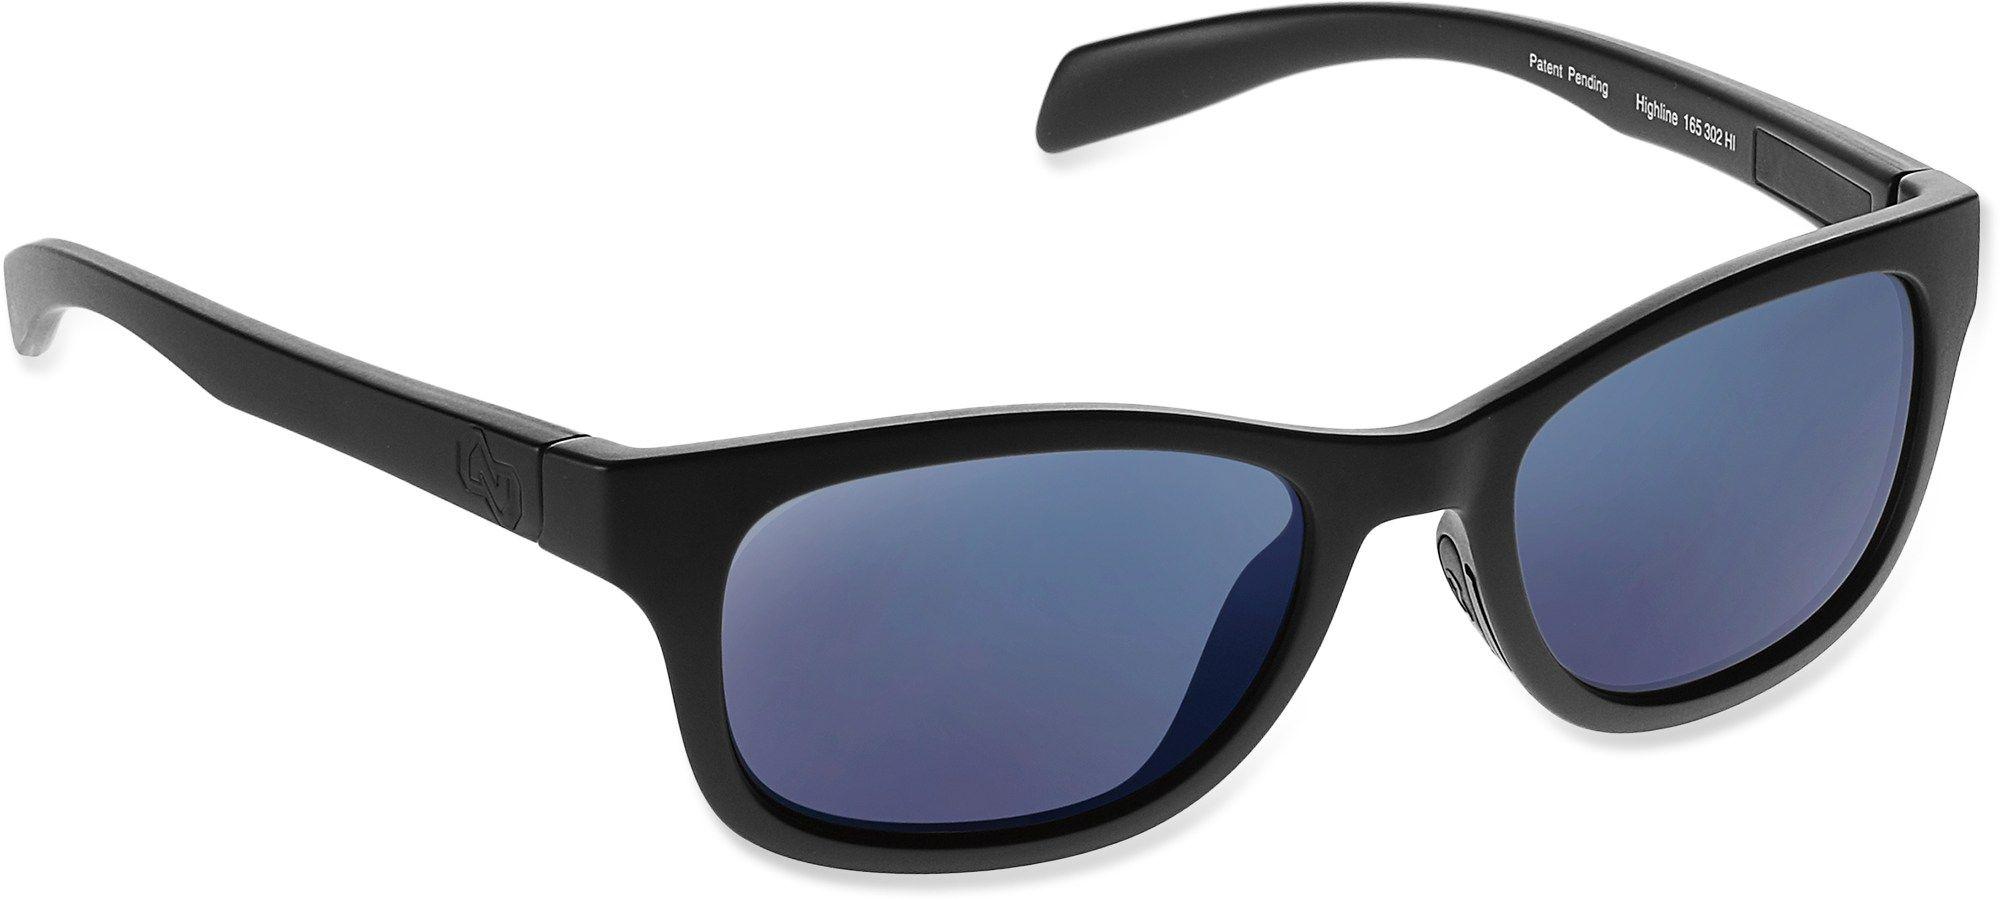 3fd56ef2d8 Native Eyewear Highline Polarized Sunglasses - Blue Reflex - Women s ...